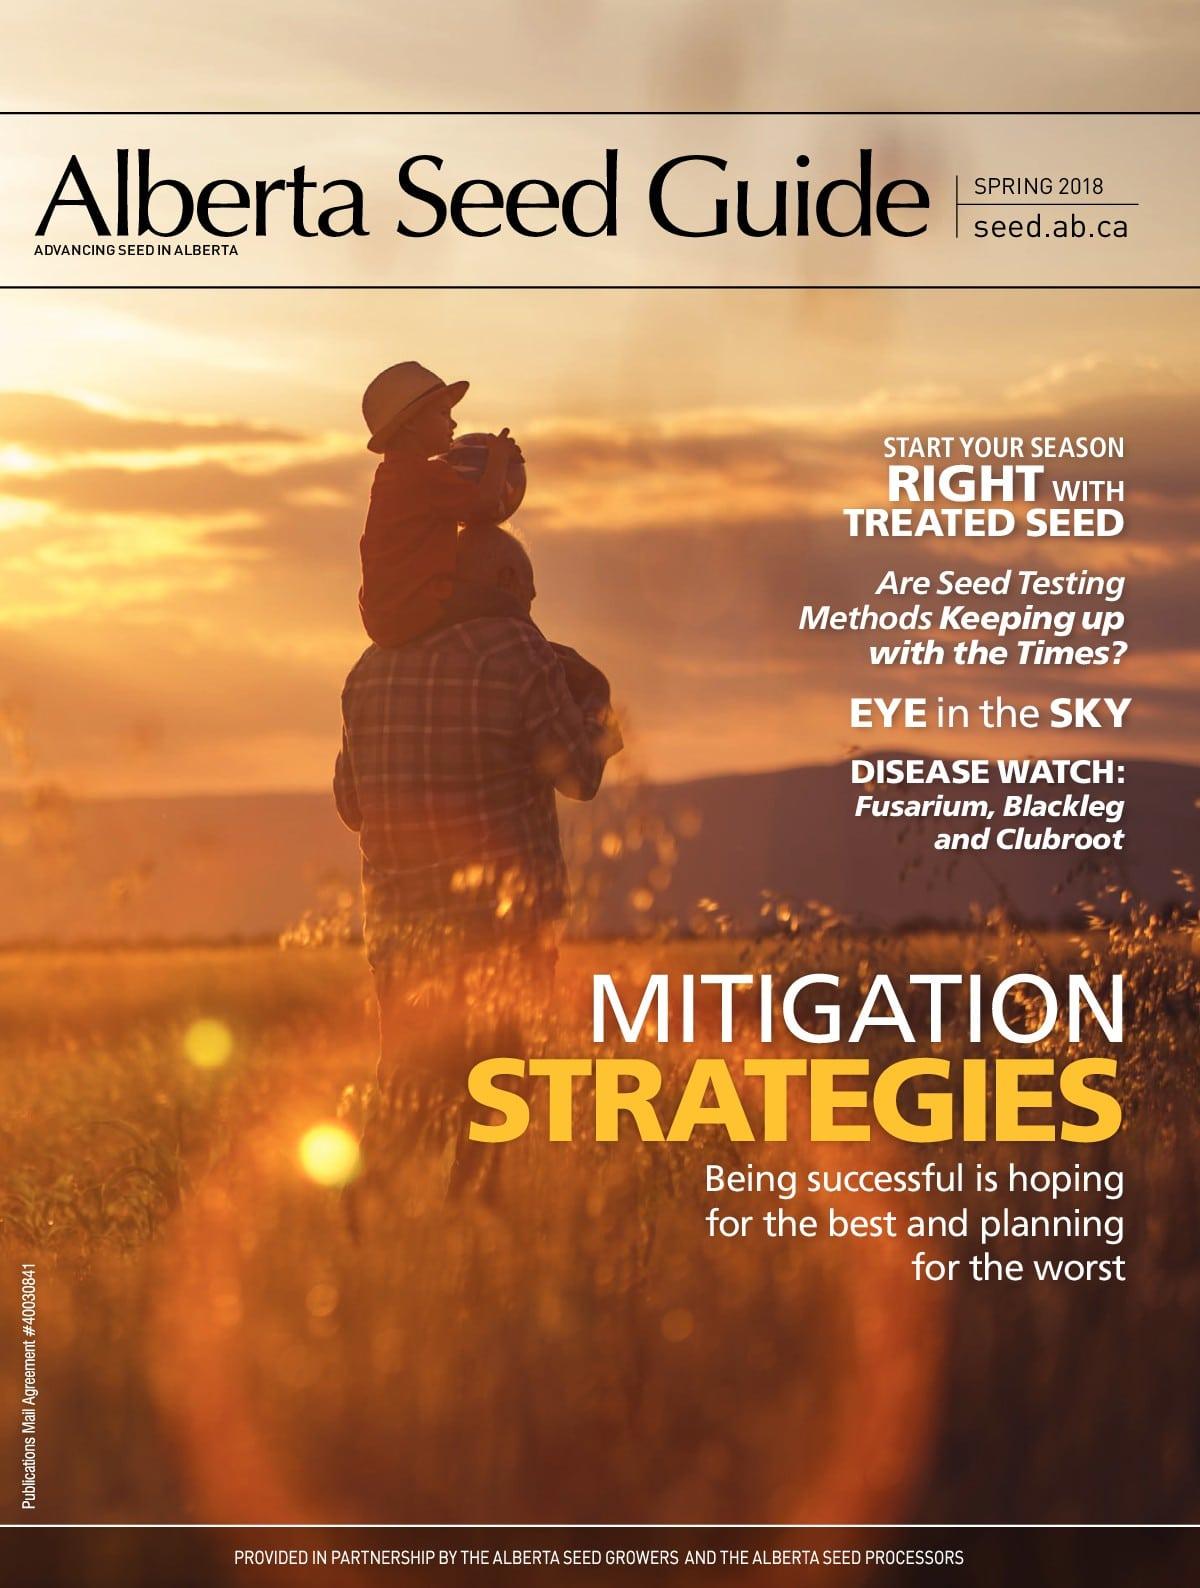 Spring 2018 – Mitigation Strategies